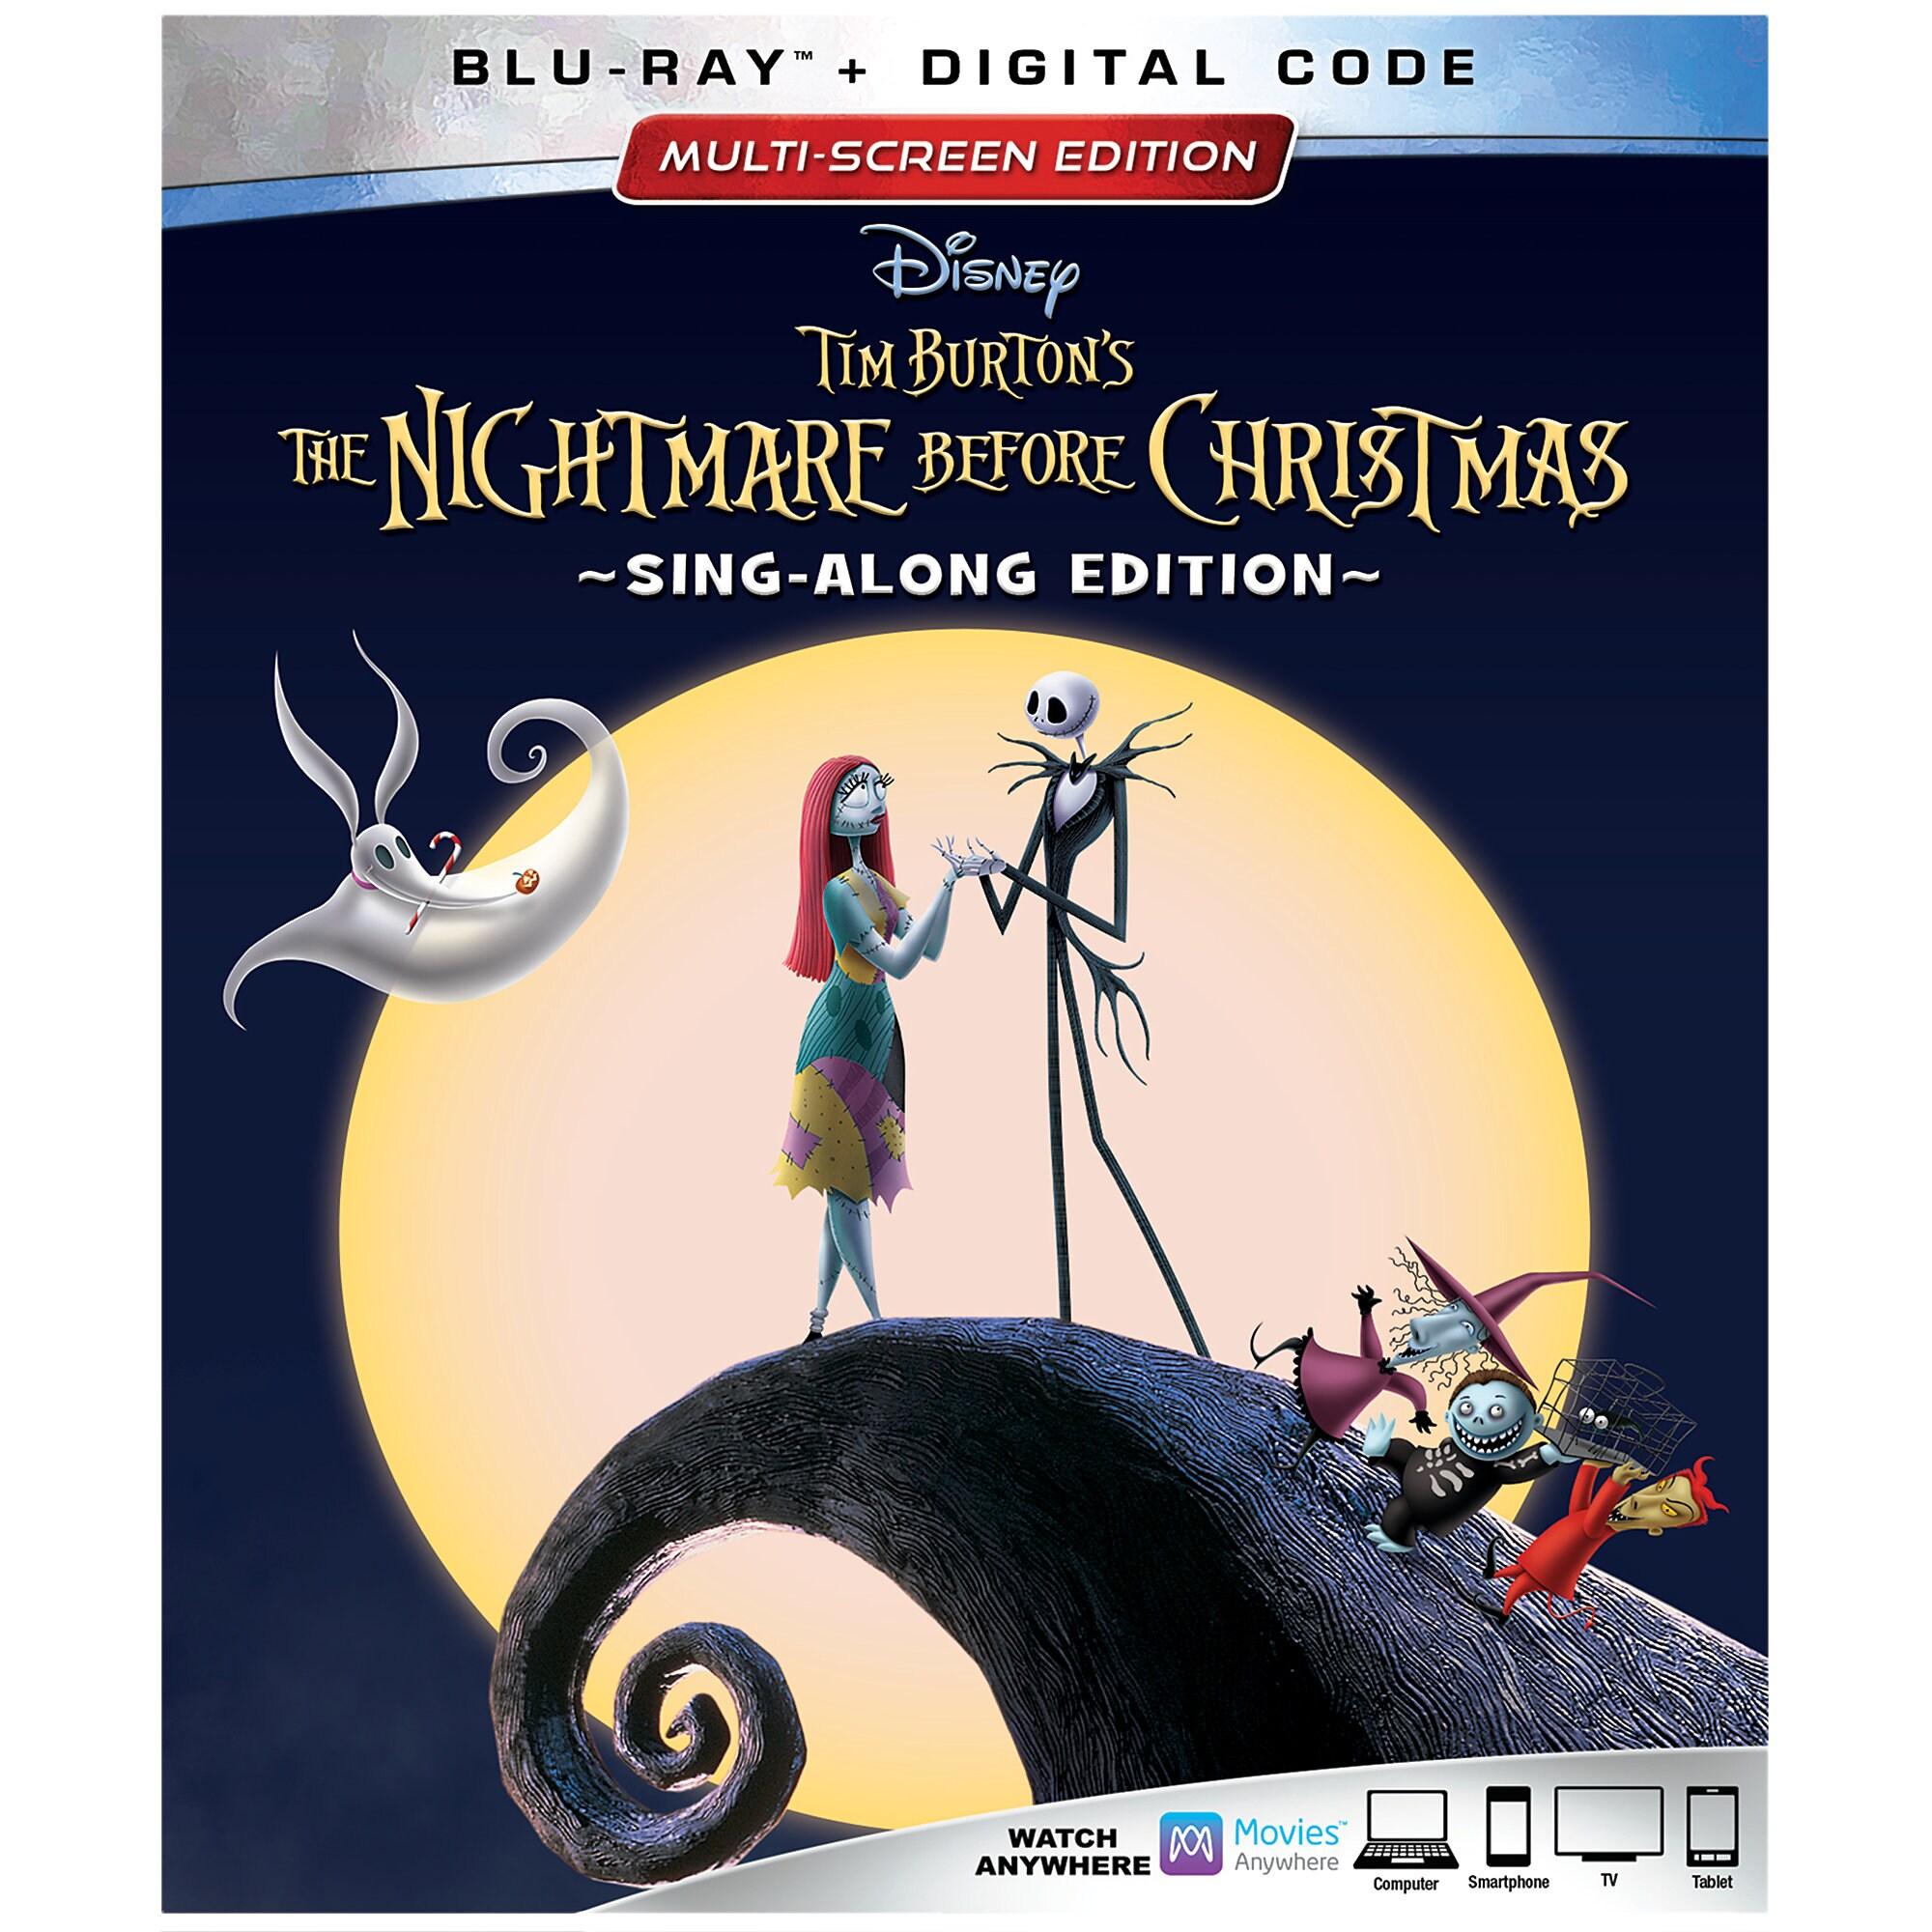 Tim Burton's The Nightmare Before Christmas 25th Anniversary Blu-ray Combo Pack Multi-Screen Edition